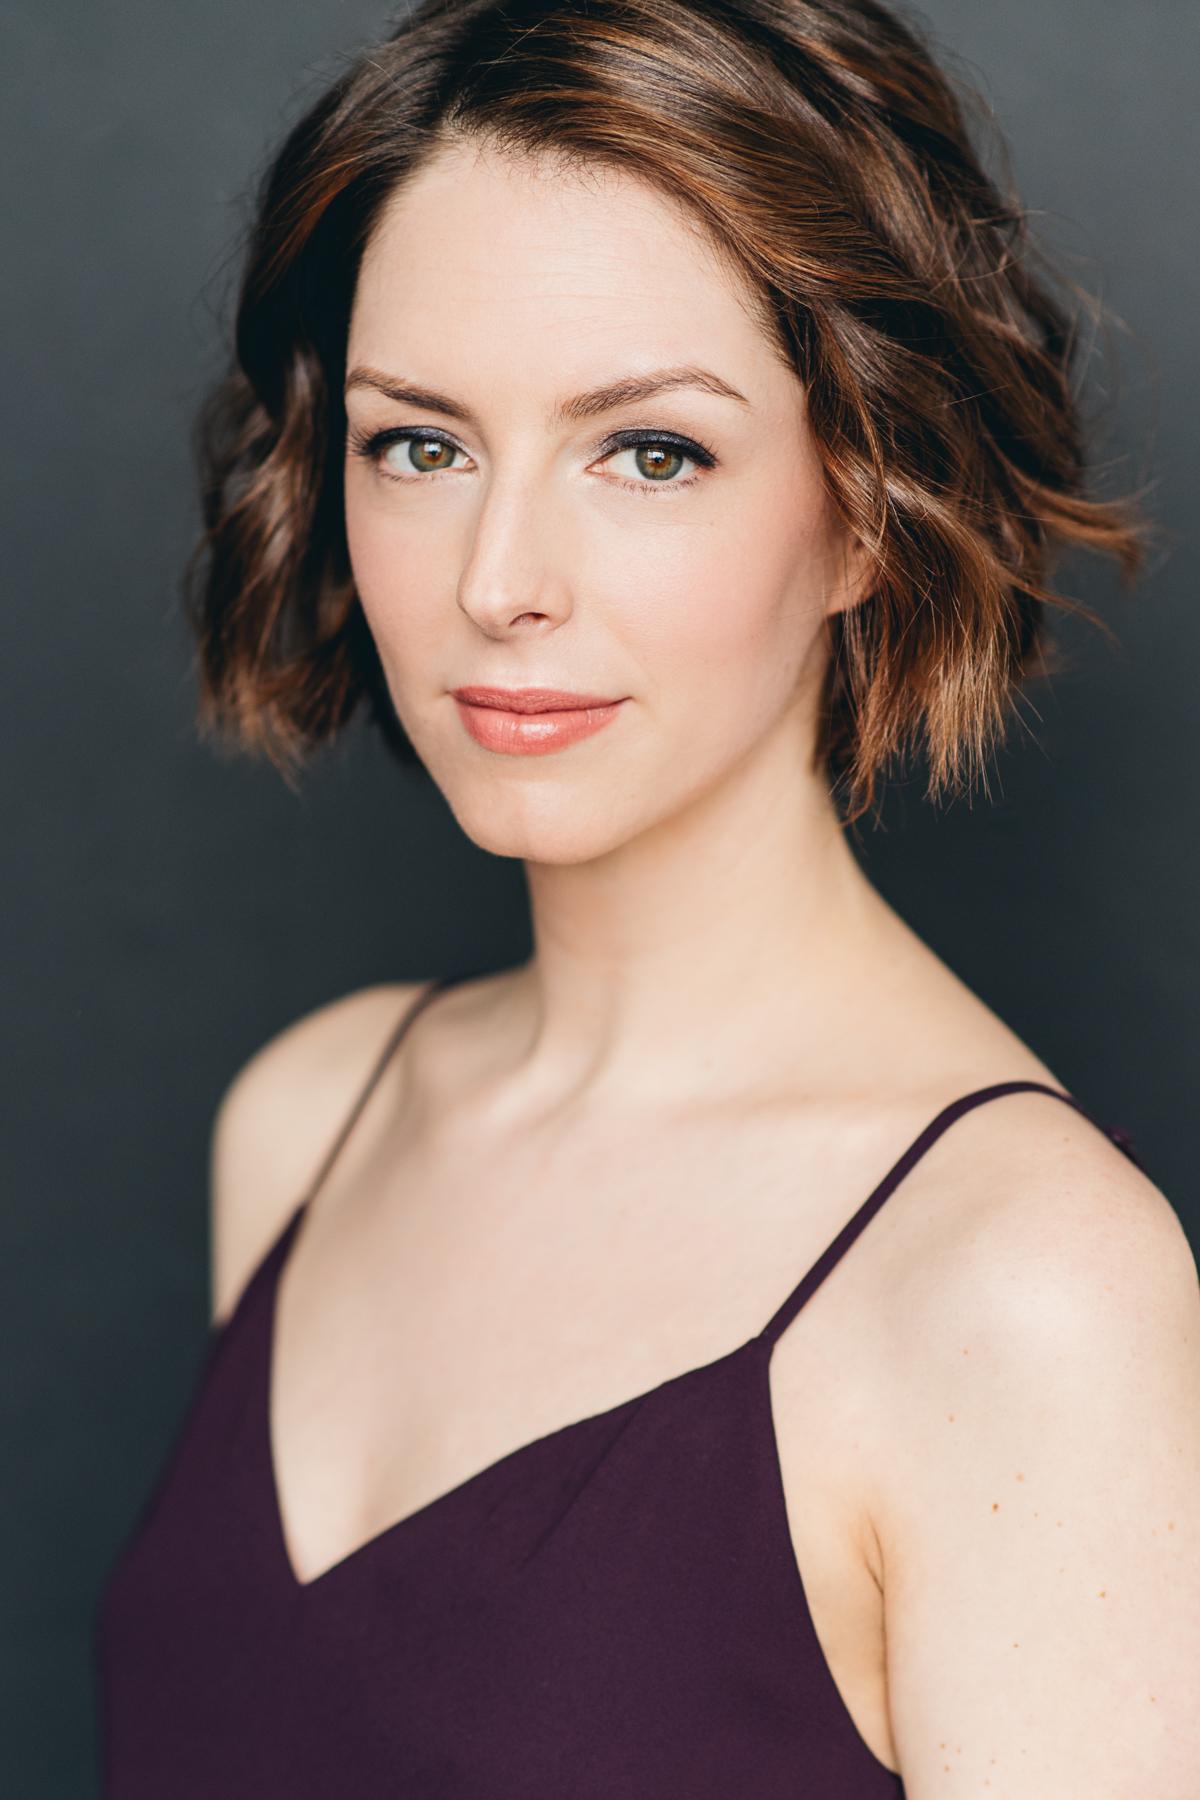 DanielleGetz-LVIMAGERY-9.JPG